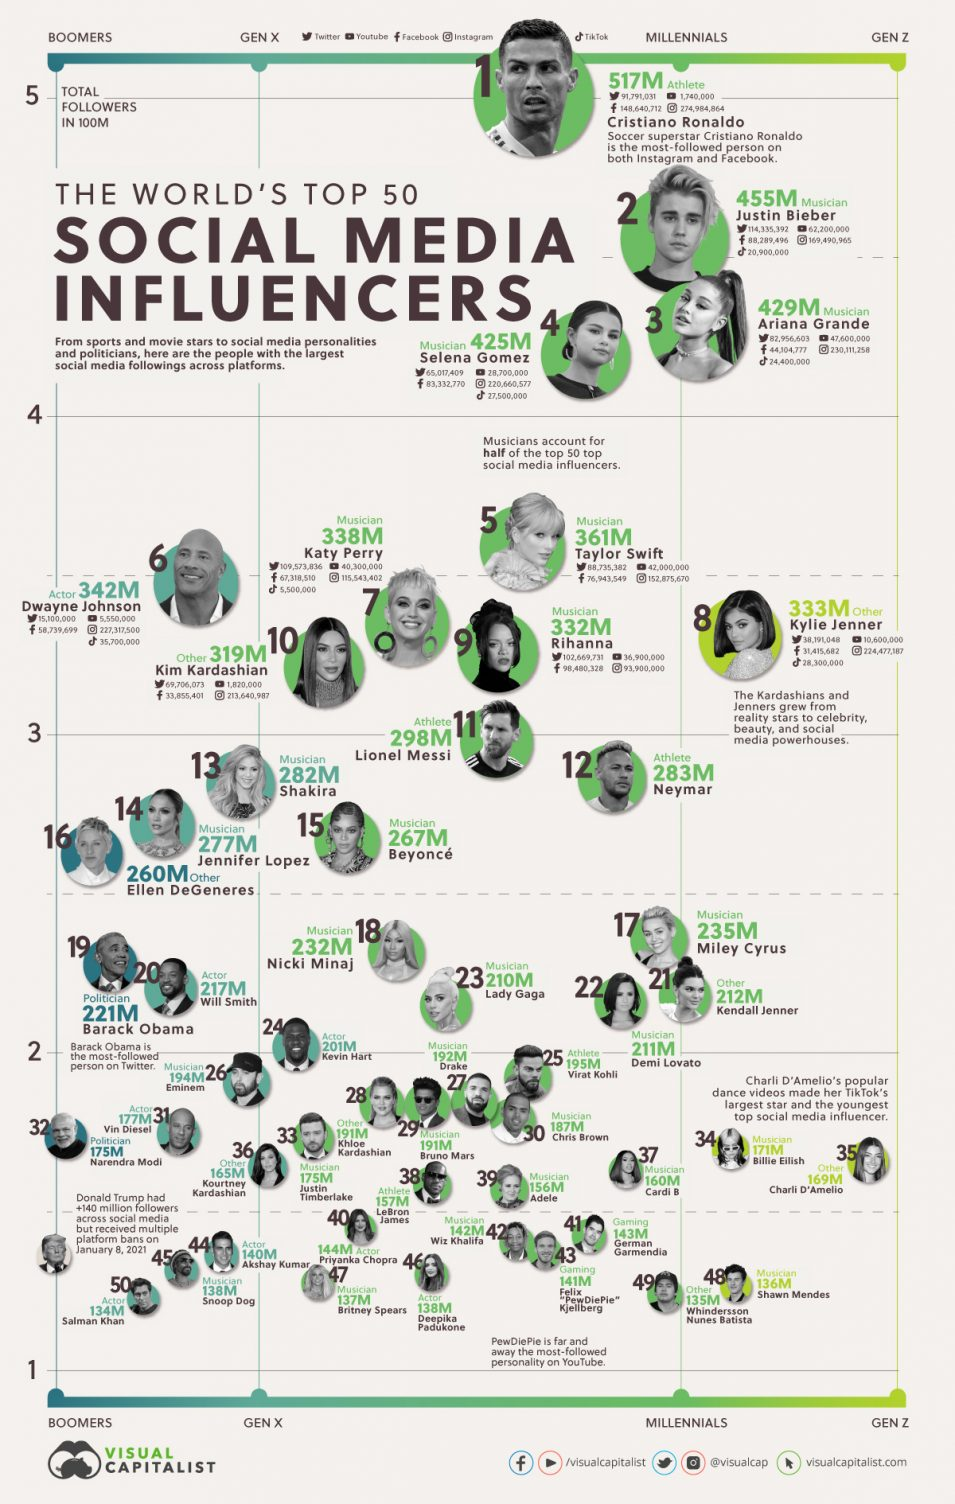 Top World 50 Social Media Influencers